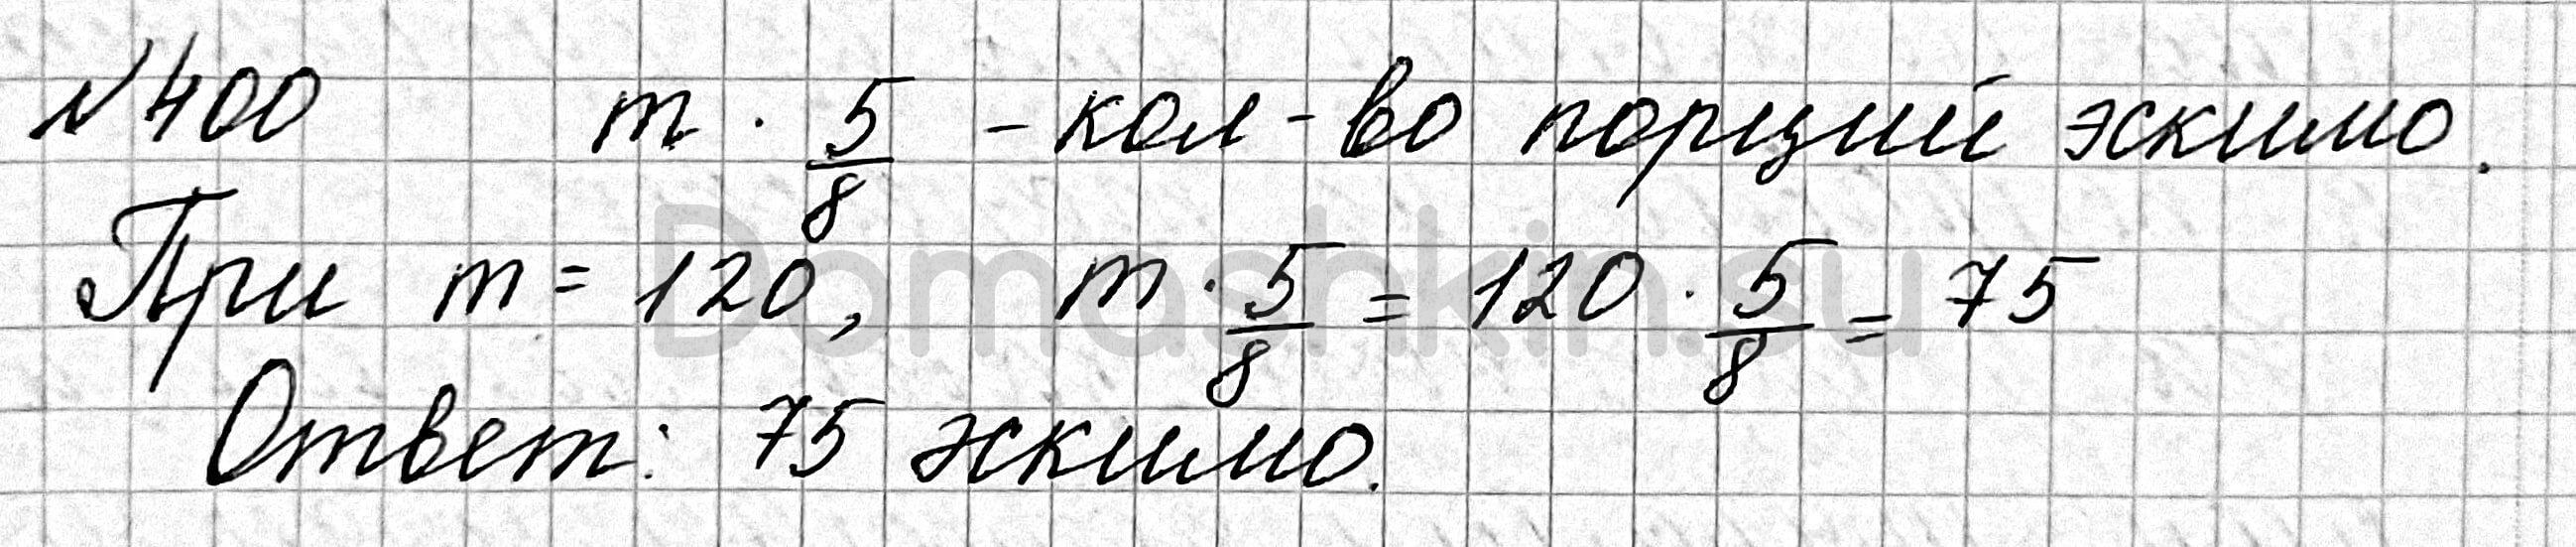 Математика 6 класс учебник Мерзляк номер 400 решение